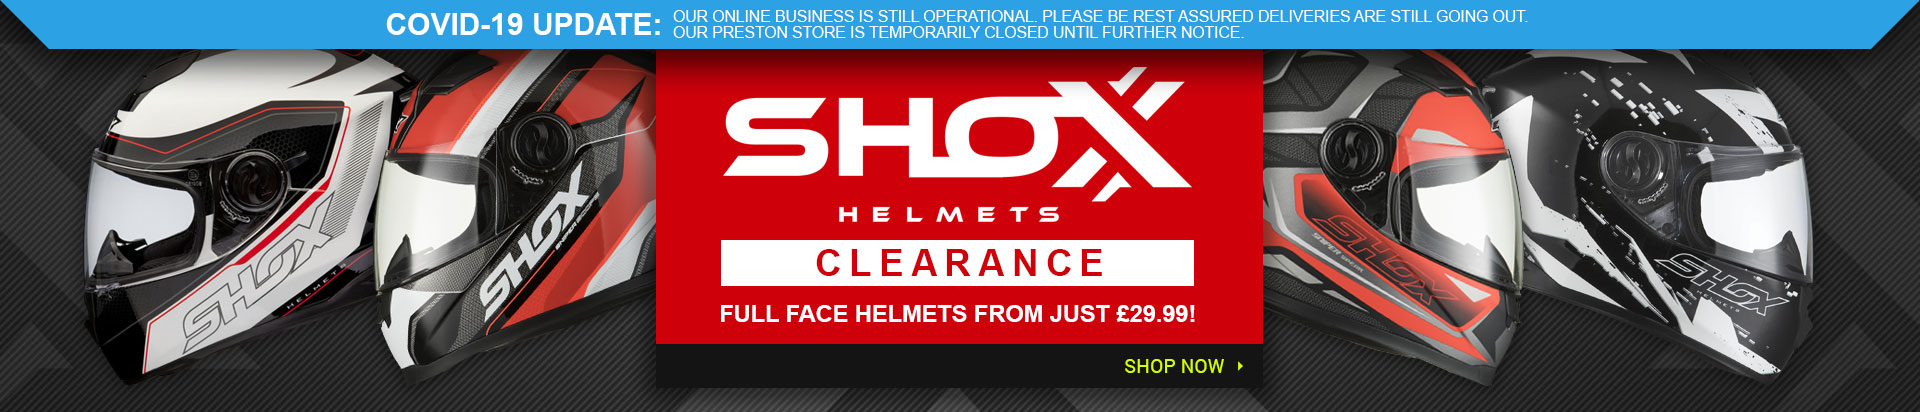 Shox Clearance Helmets